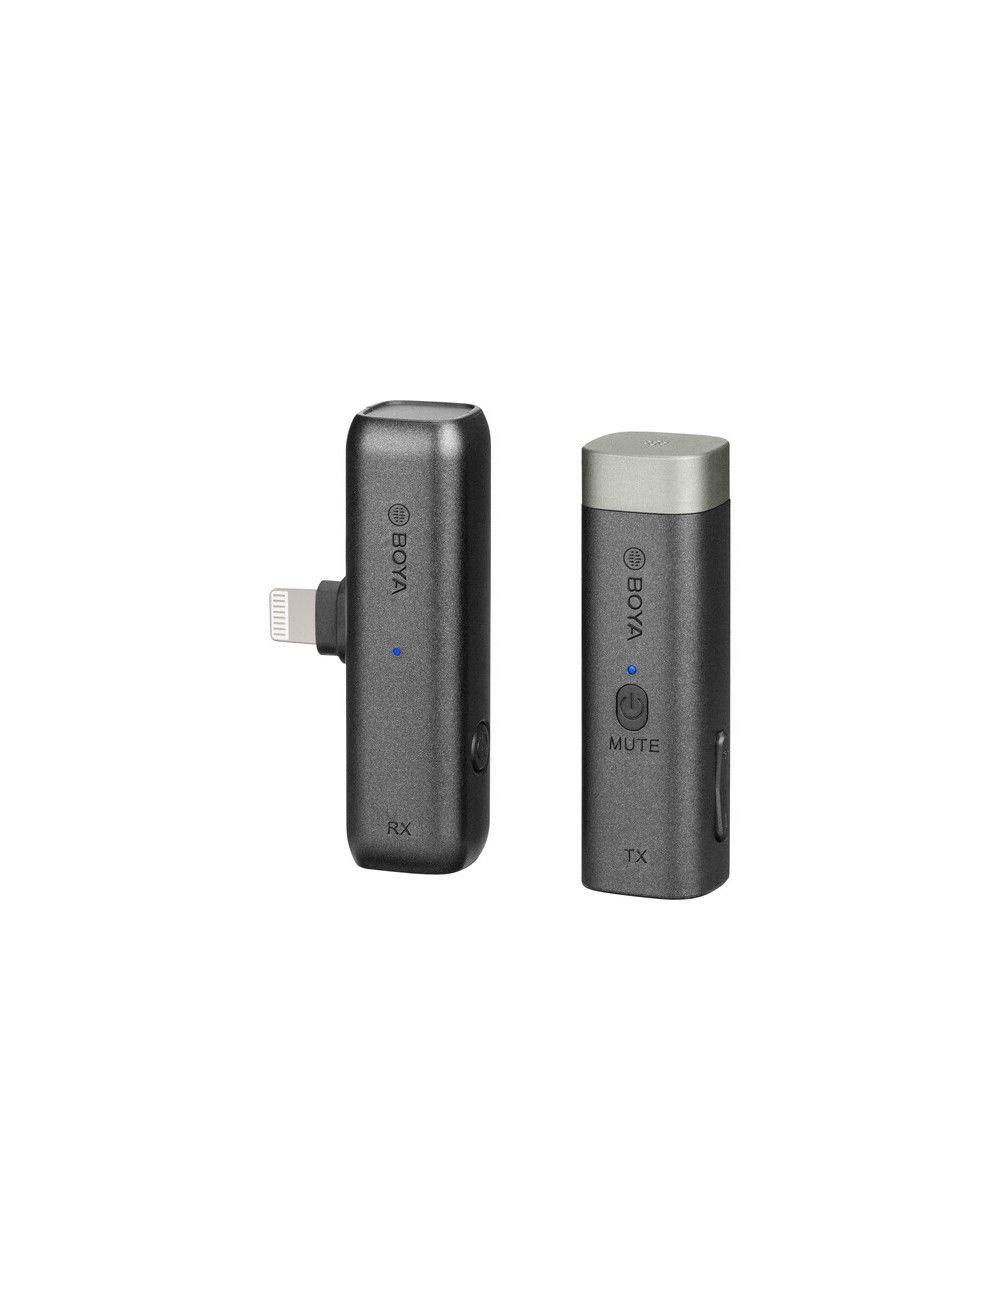 Lente Tamron 70-200 f2.8 DI VC USD G2 para NIKON Zoom Teleobjetivo Luminoso